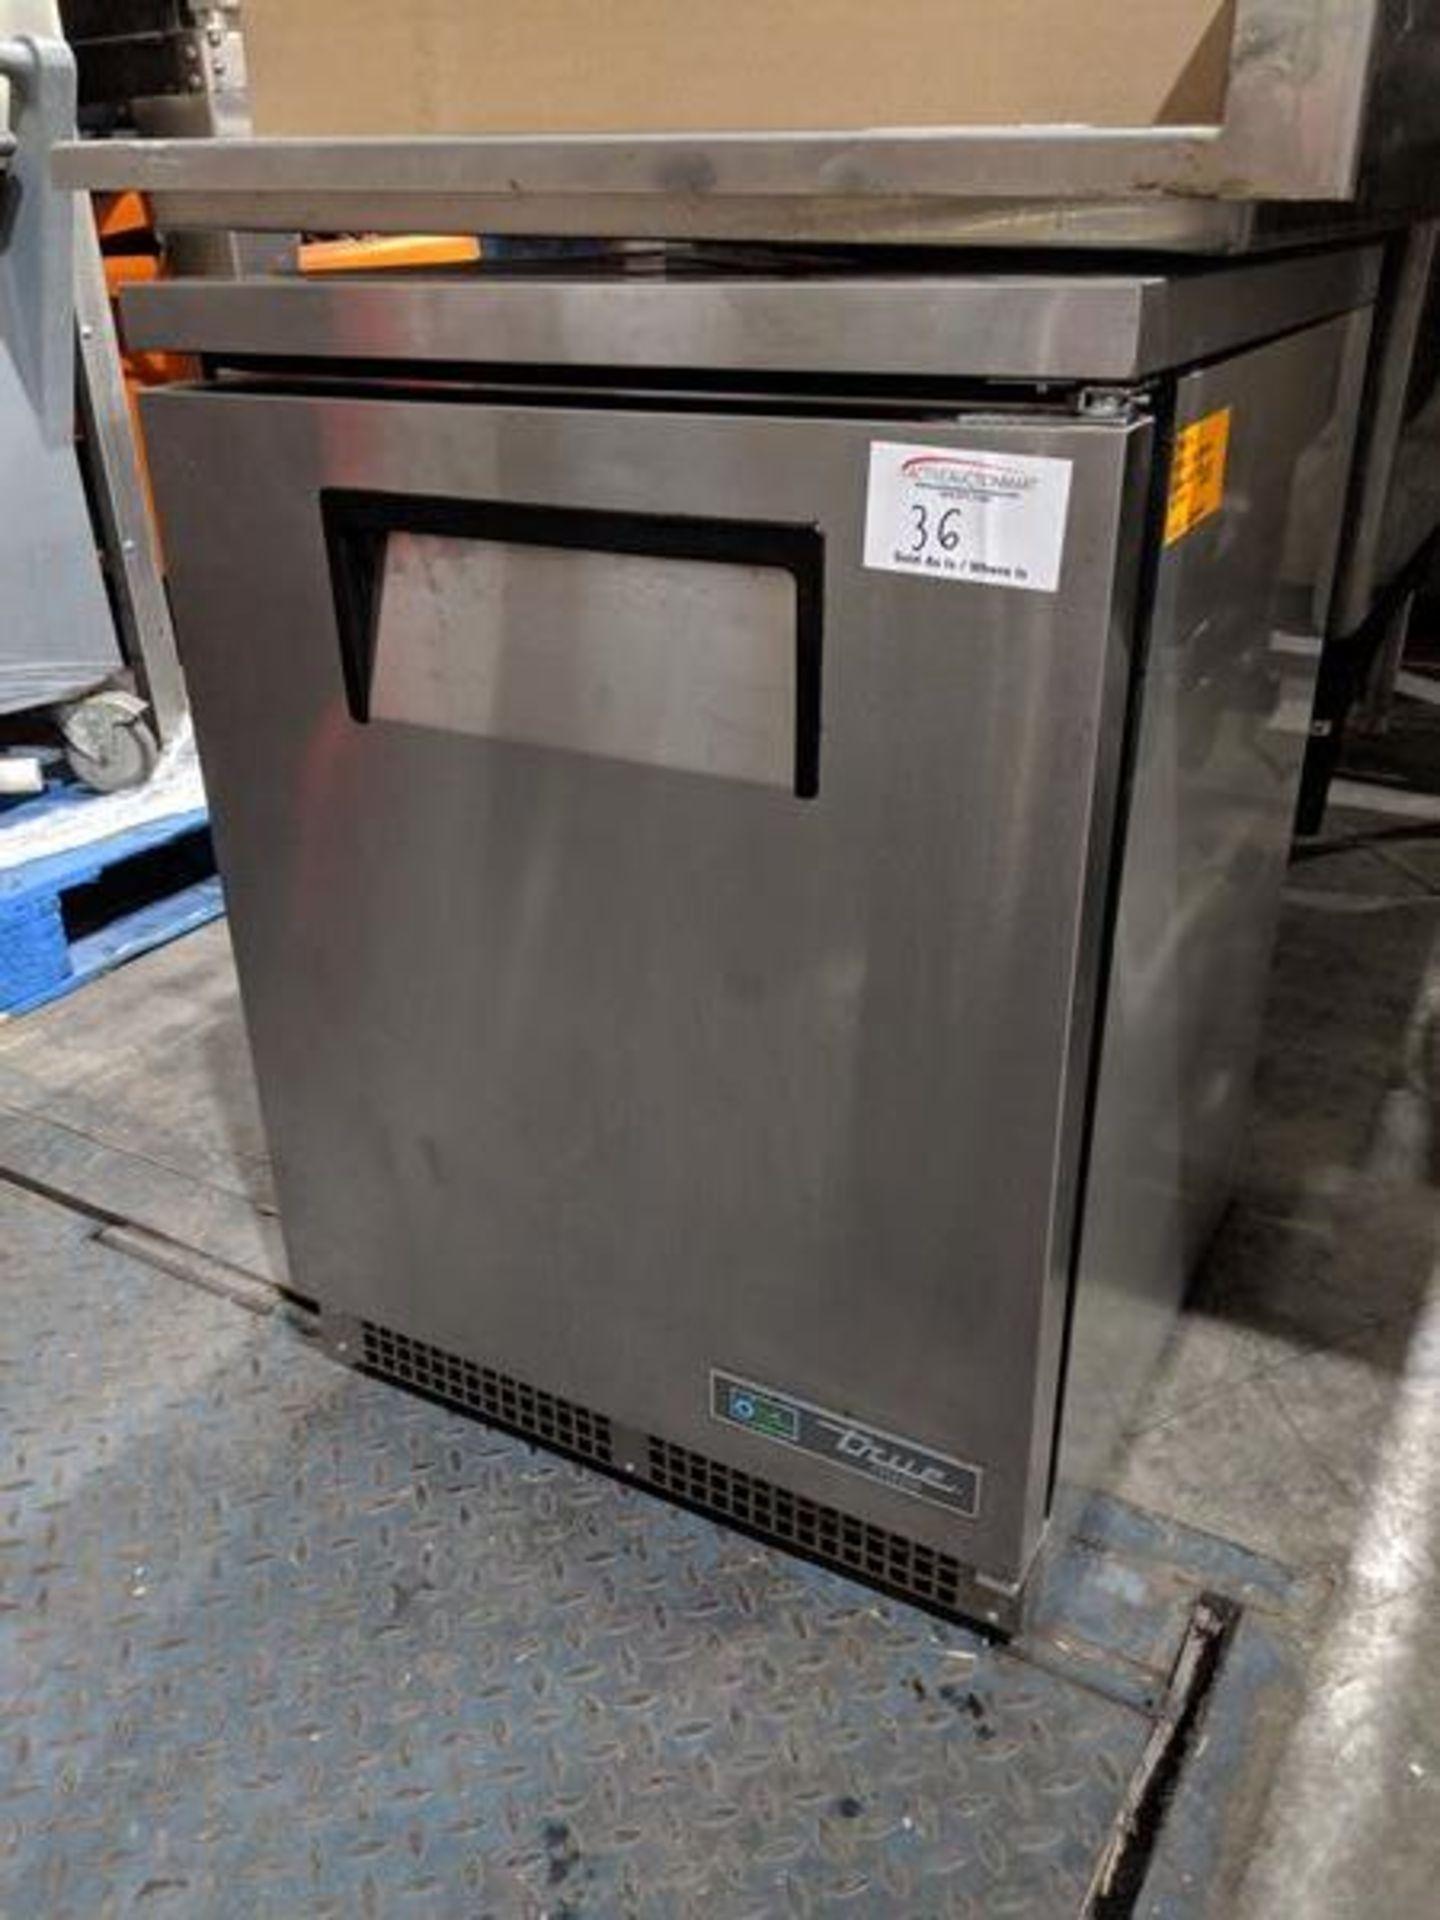 Lot 36 - As new TUC-24F-HC Undercounter Freezer. New Cost $2700.00